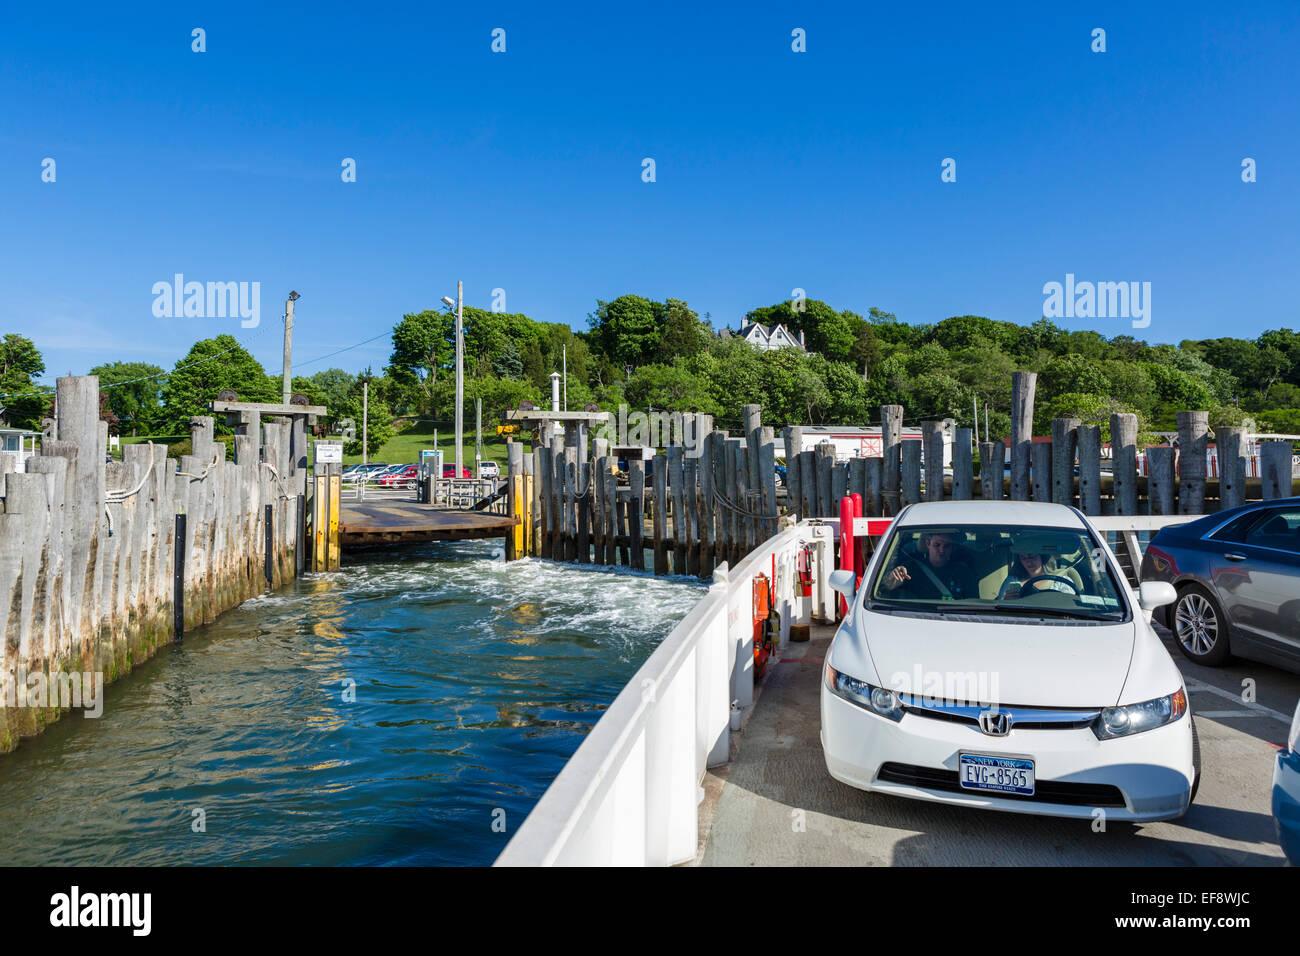 Norden der Fähre verlassen Shelter Island für Greenport, Suffolk County, Long Island, NY, USA Stockfoto